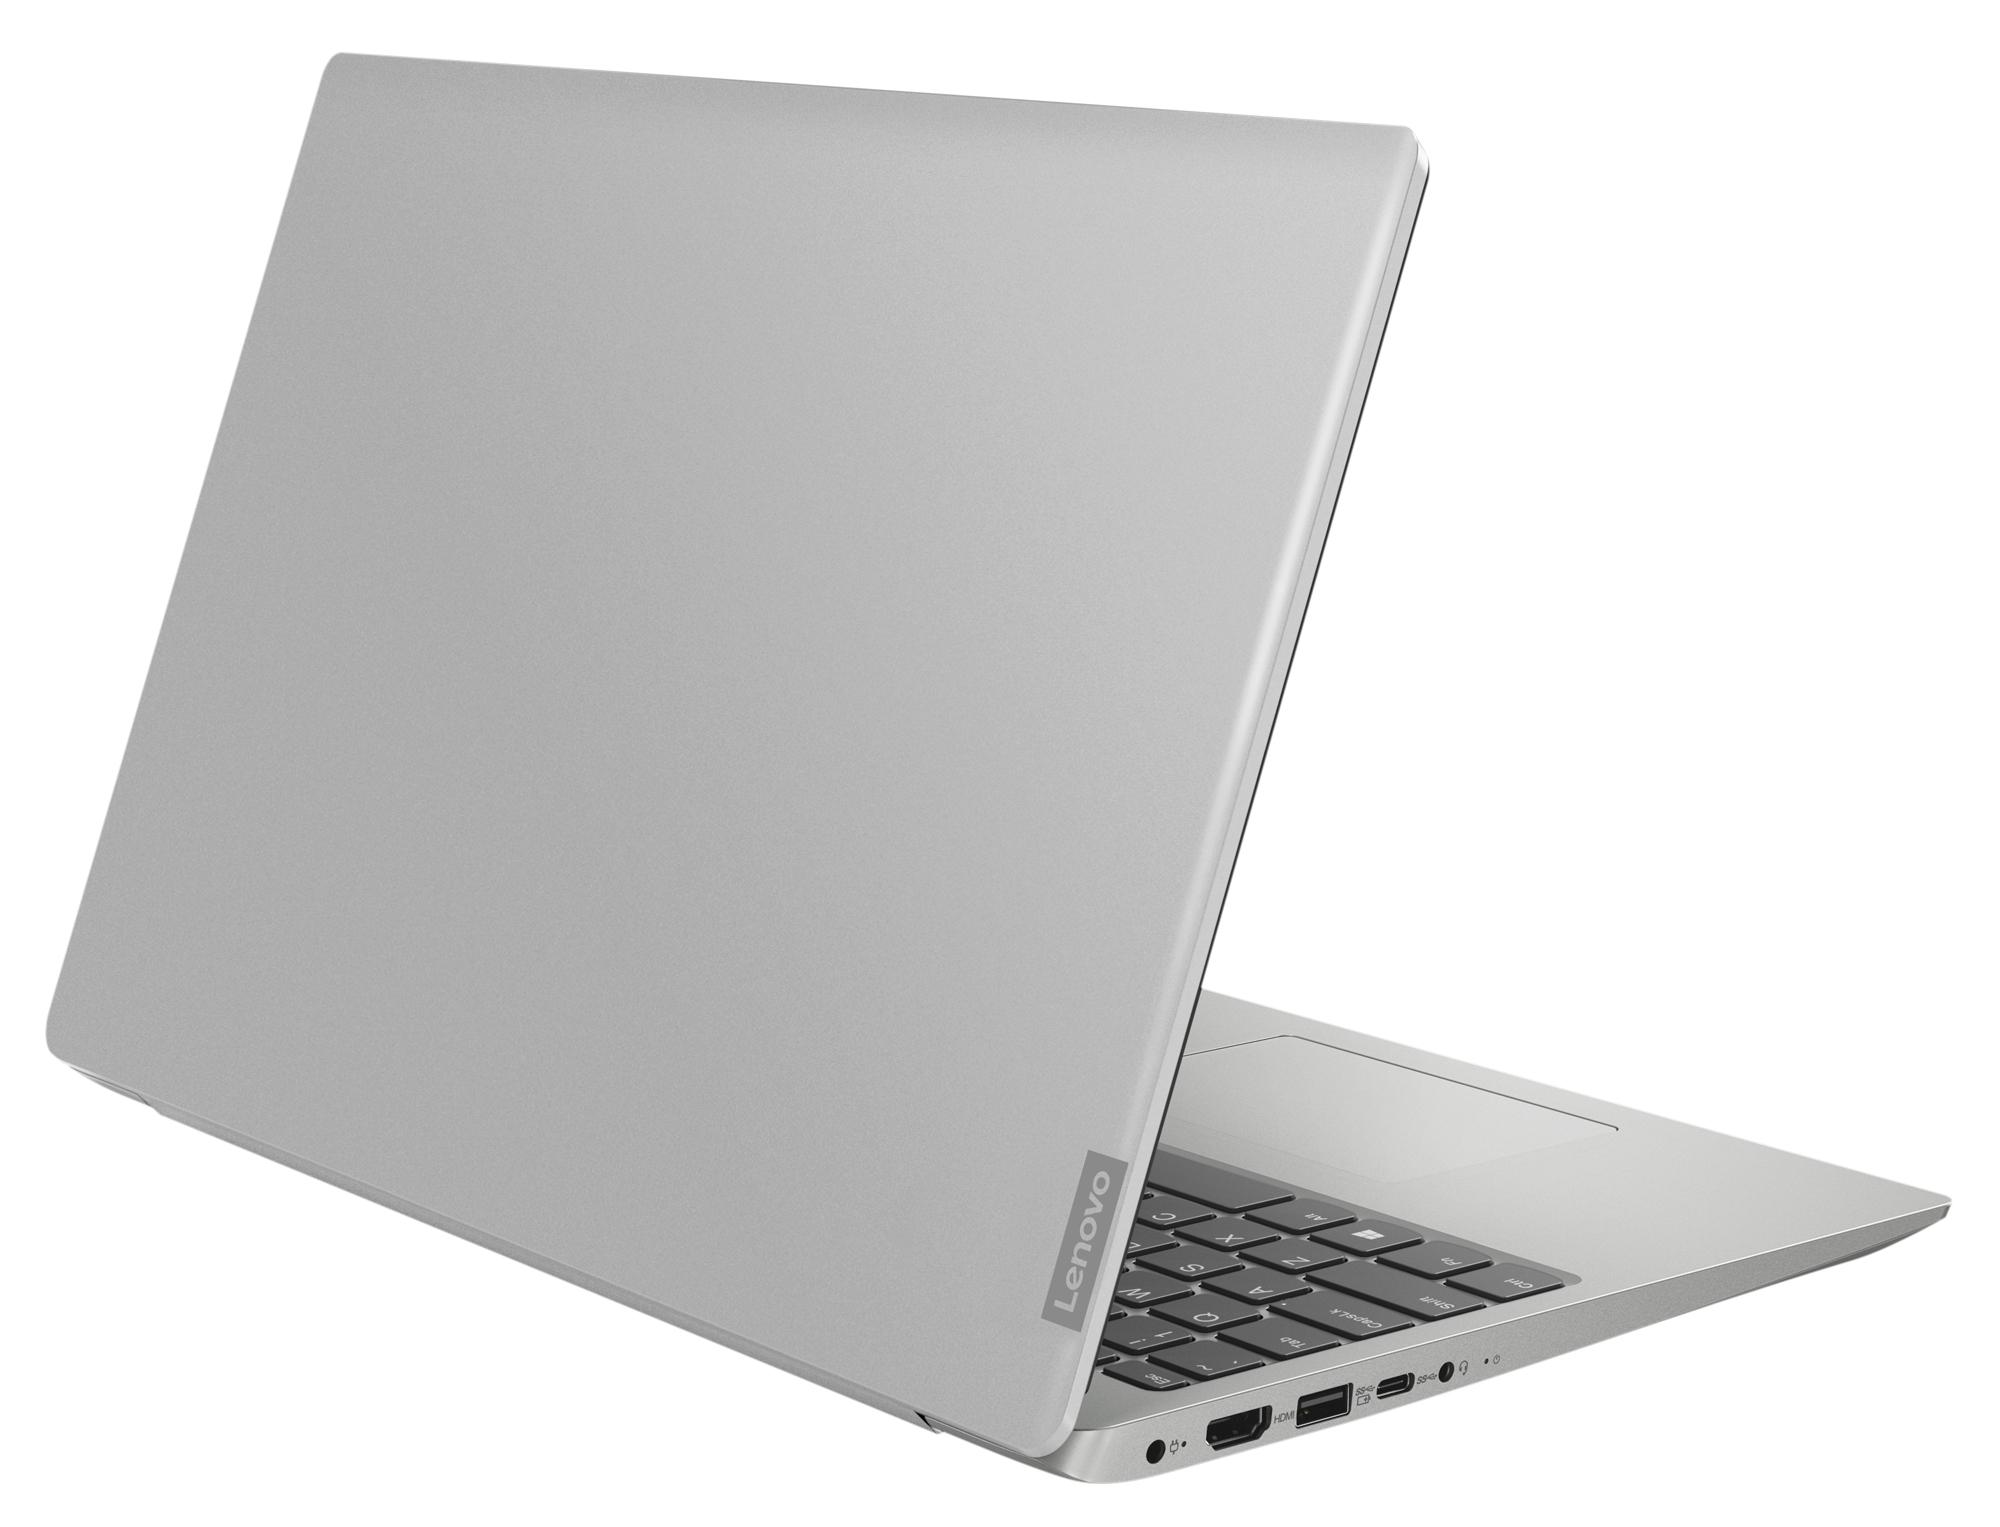 Фото  Ноутбук Lenovo ideapad 330s-15IKB Platinum Grey (81F500PURU)